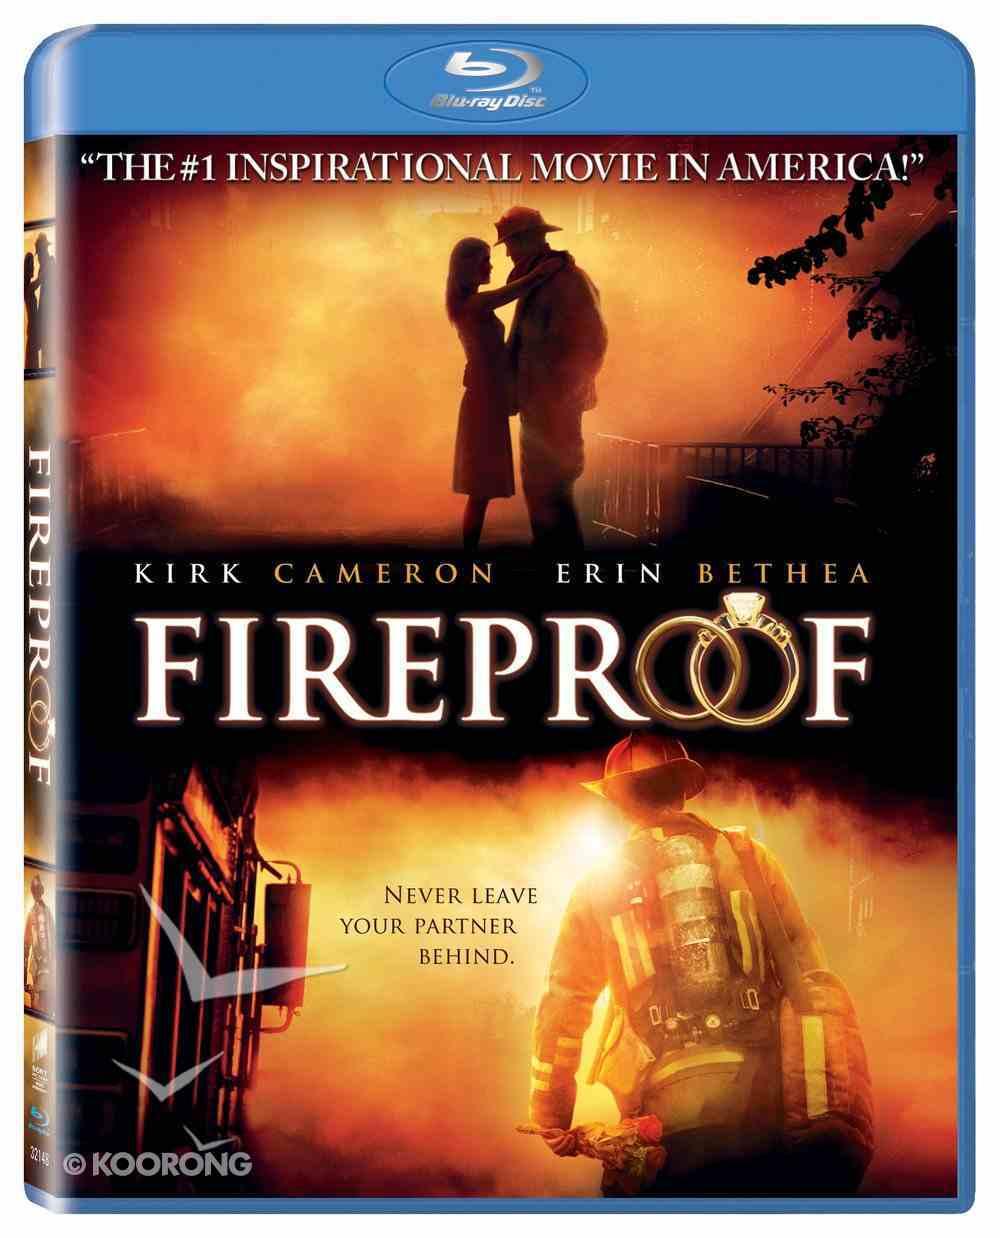 Fireproof (Blu-ray) Blu-ray Disc